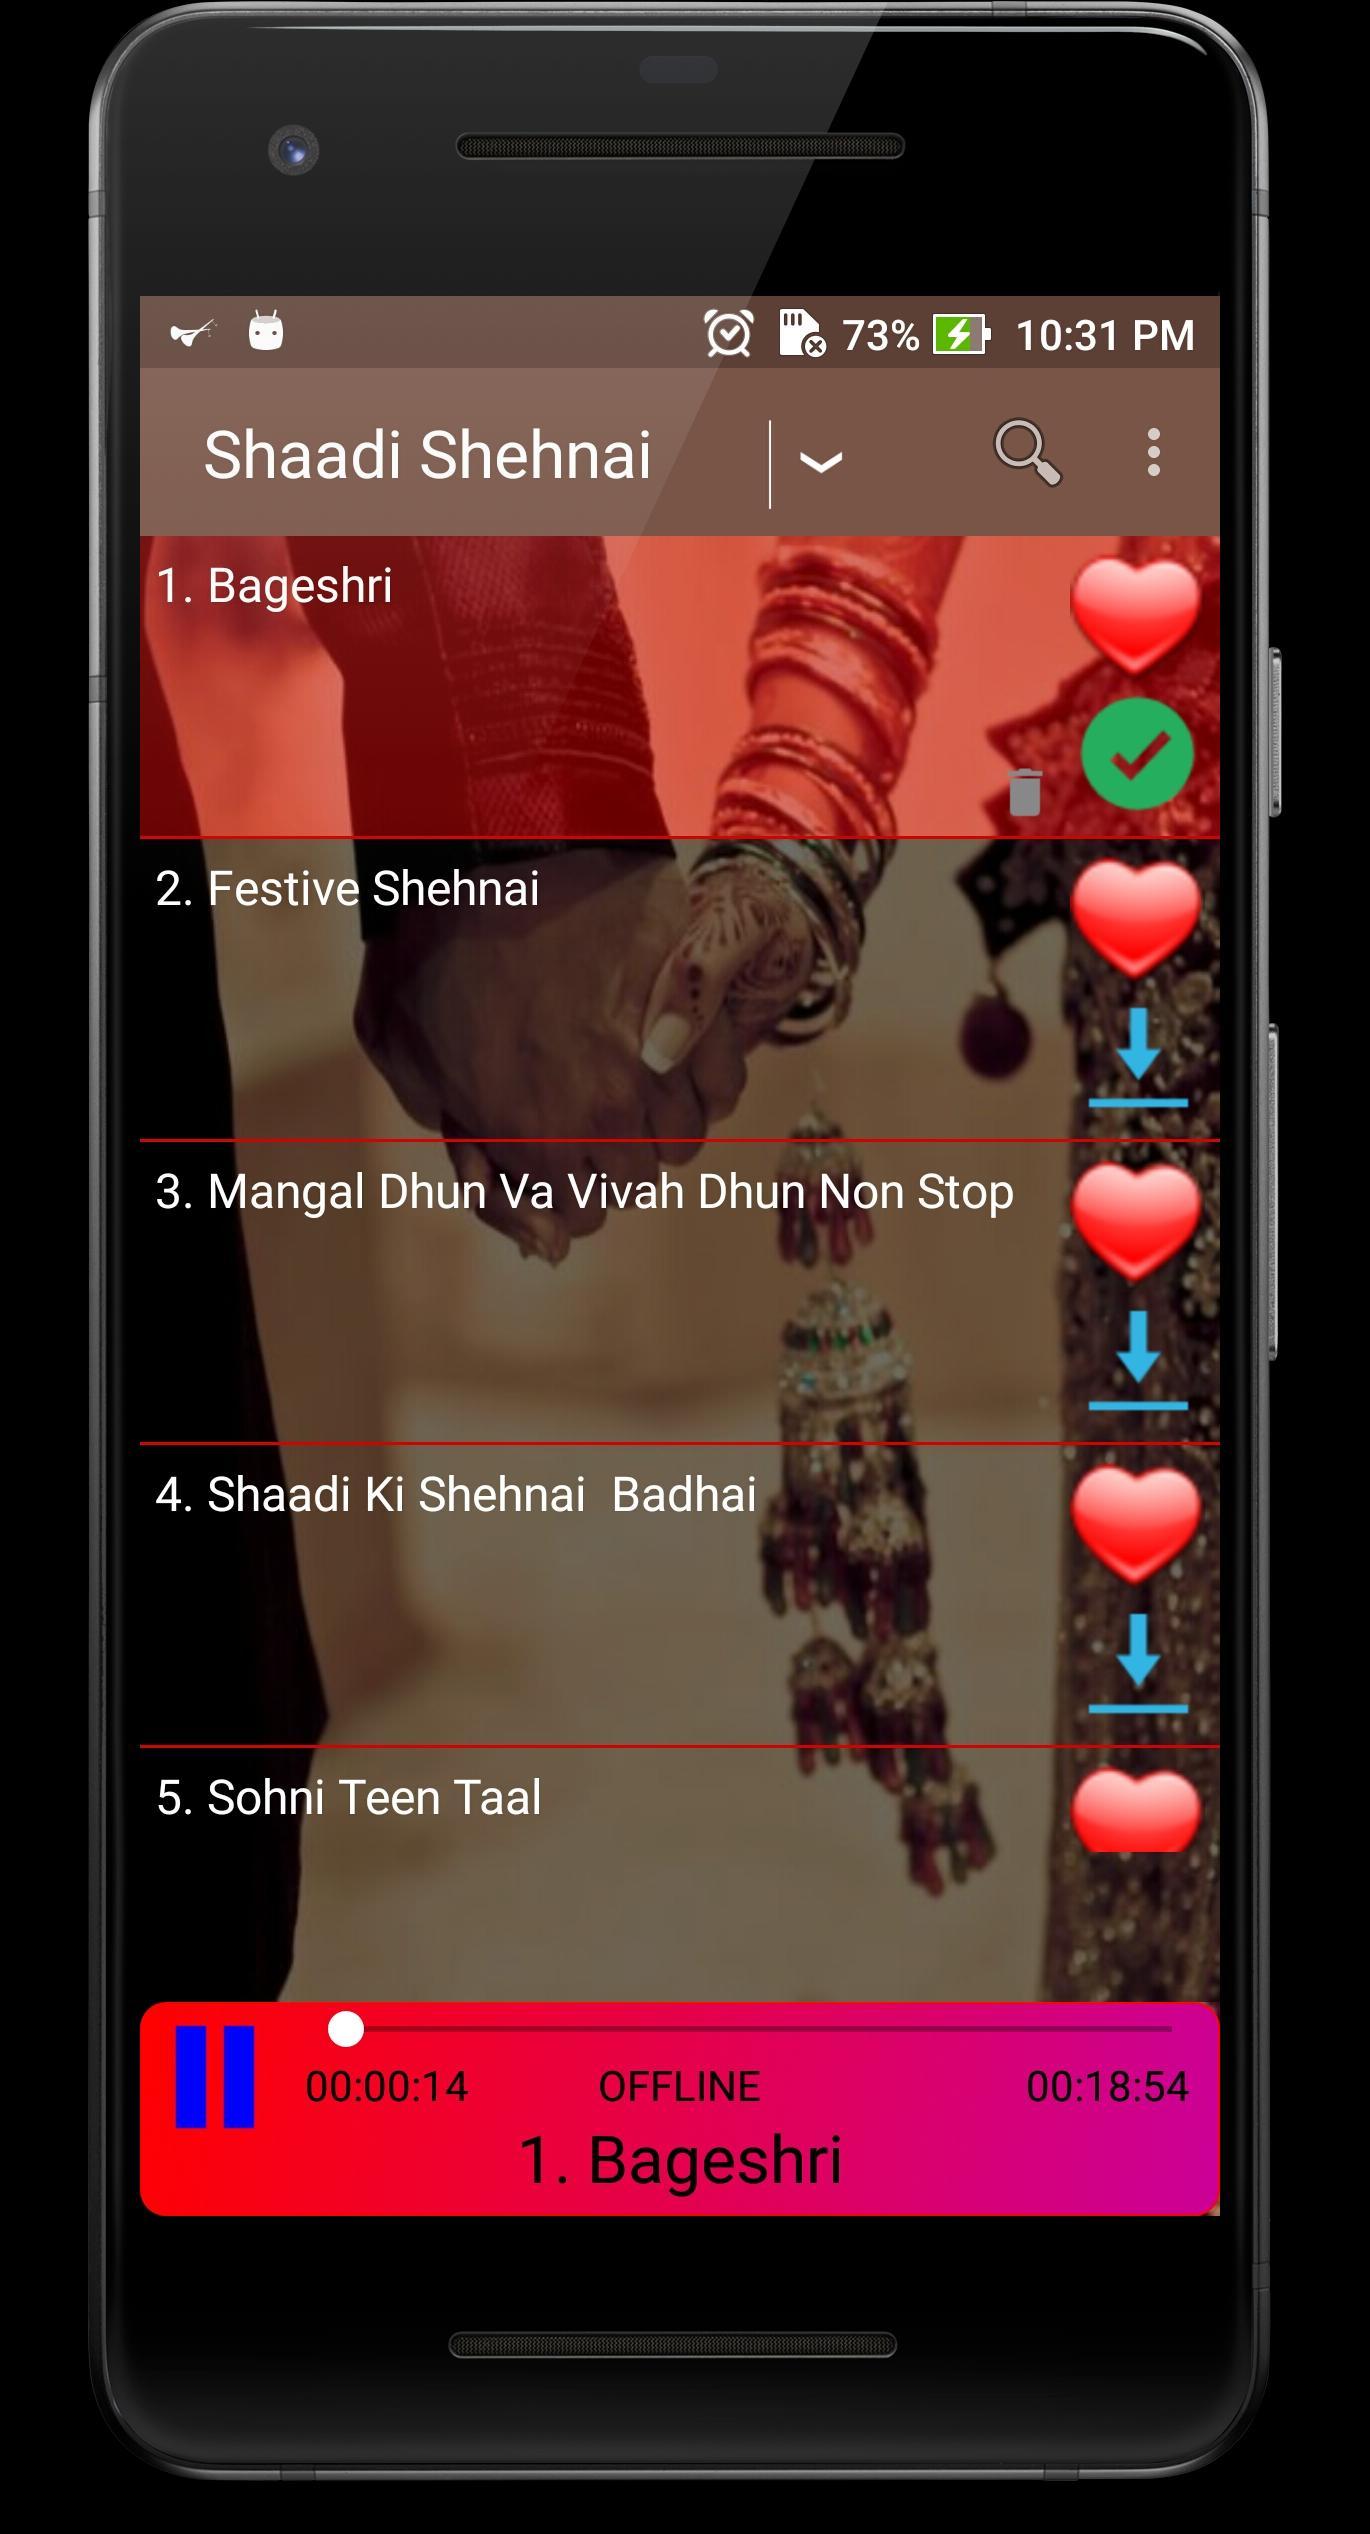 Shaadi Shehnai for Android - APK Download